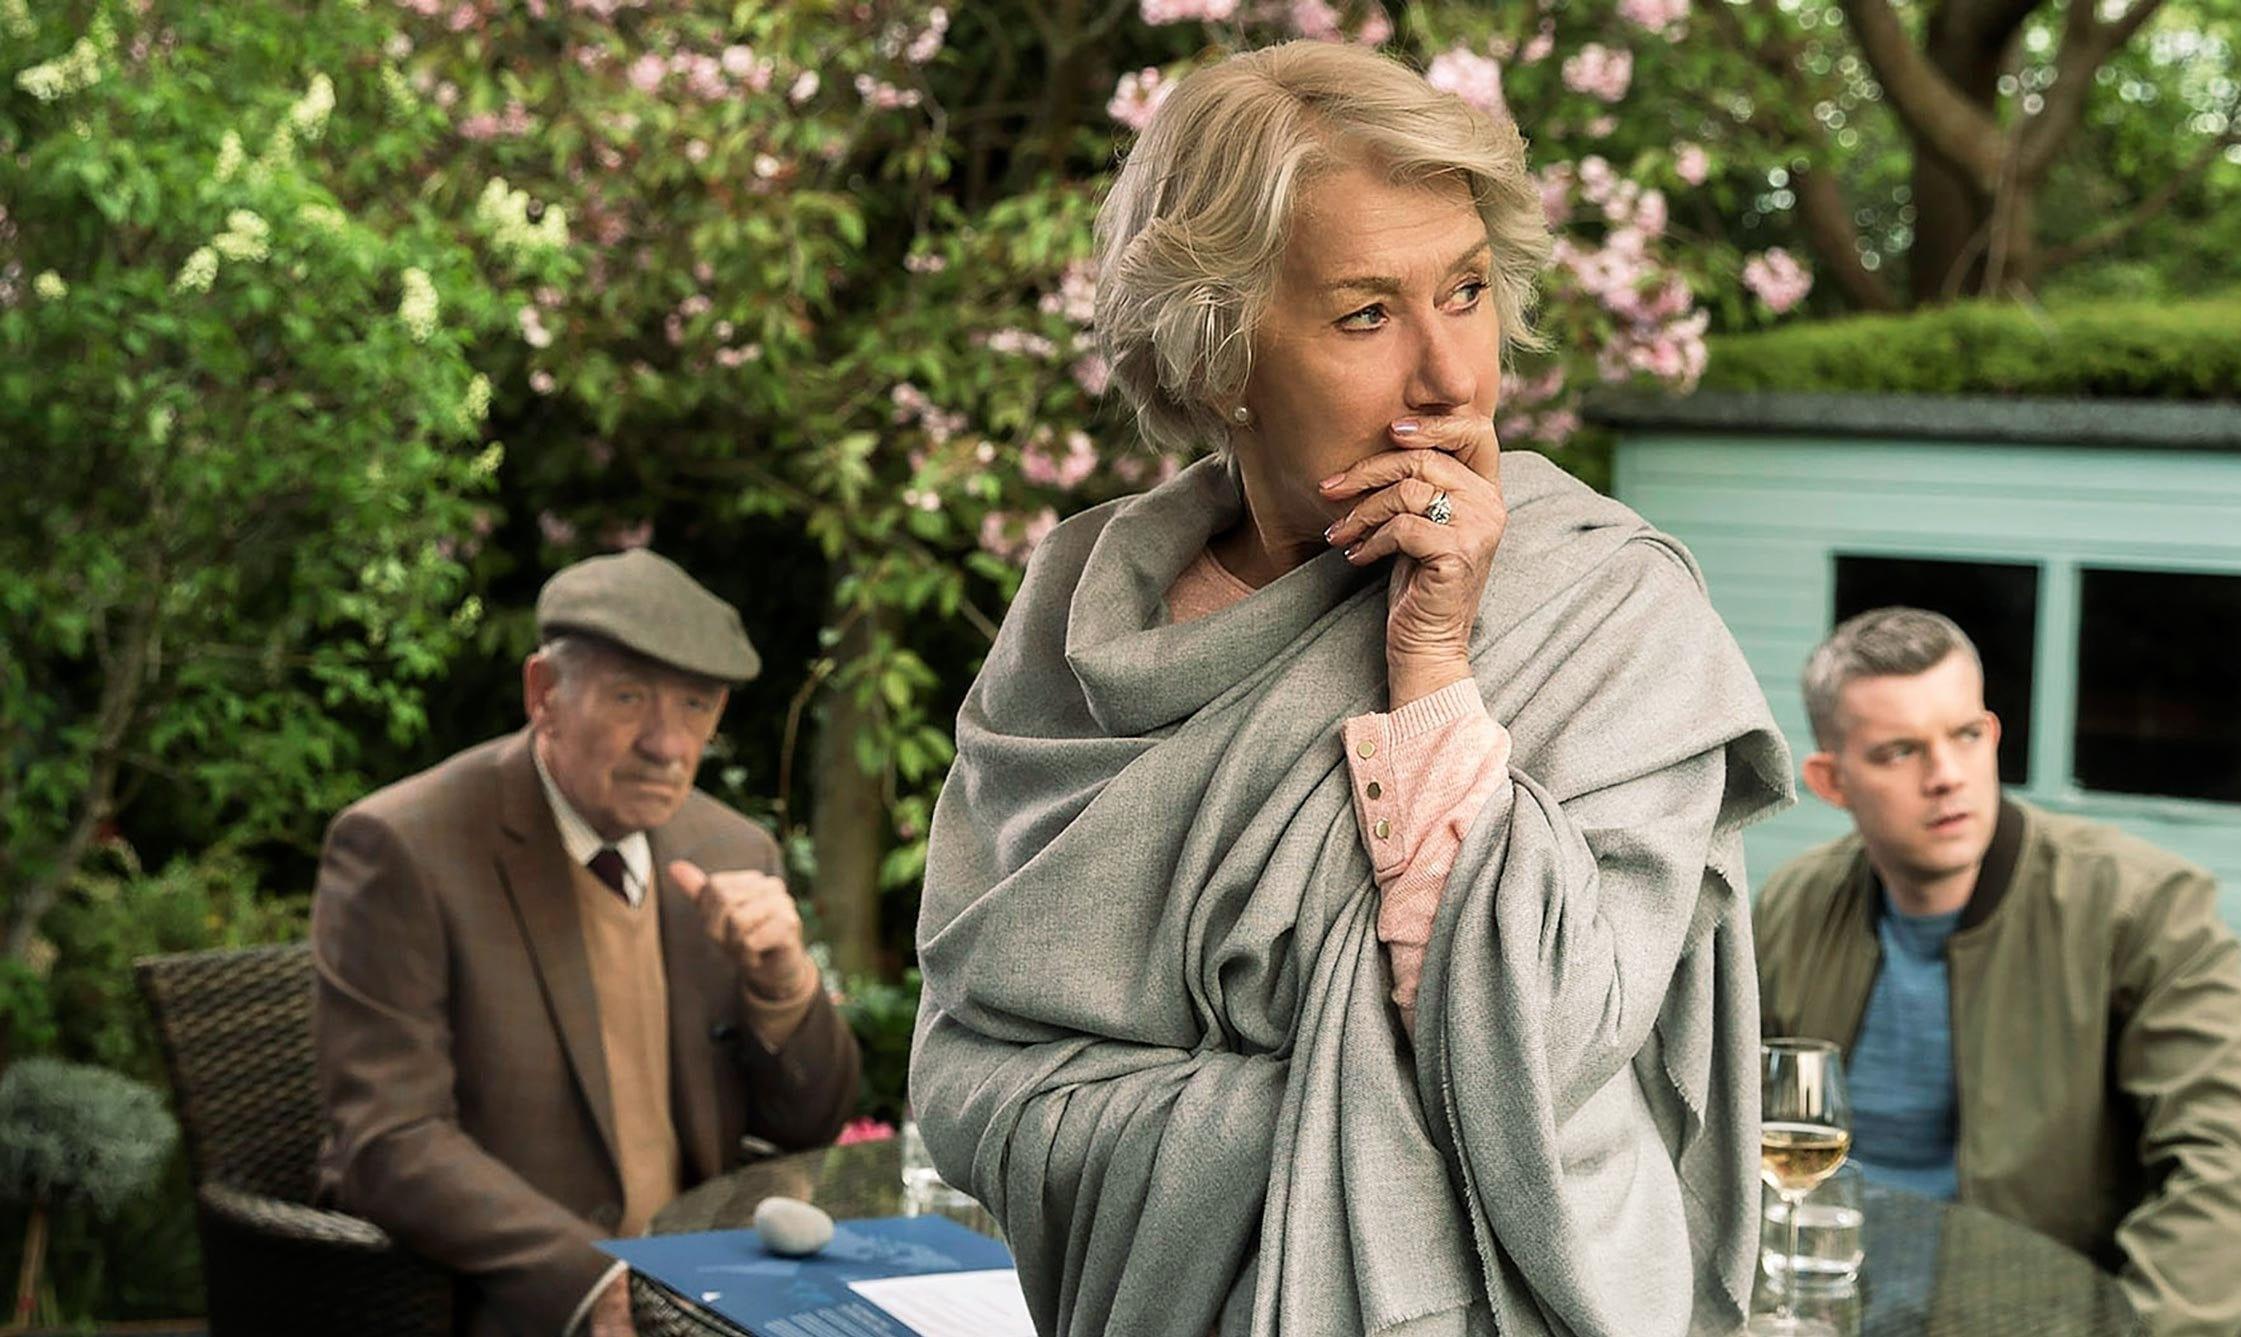 L'inganno perfetto, in sala il thriller con Helen Mirren e Ian McKellen